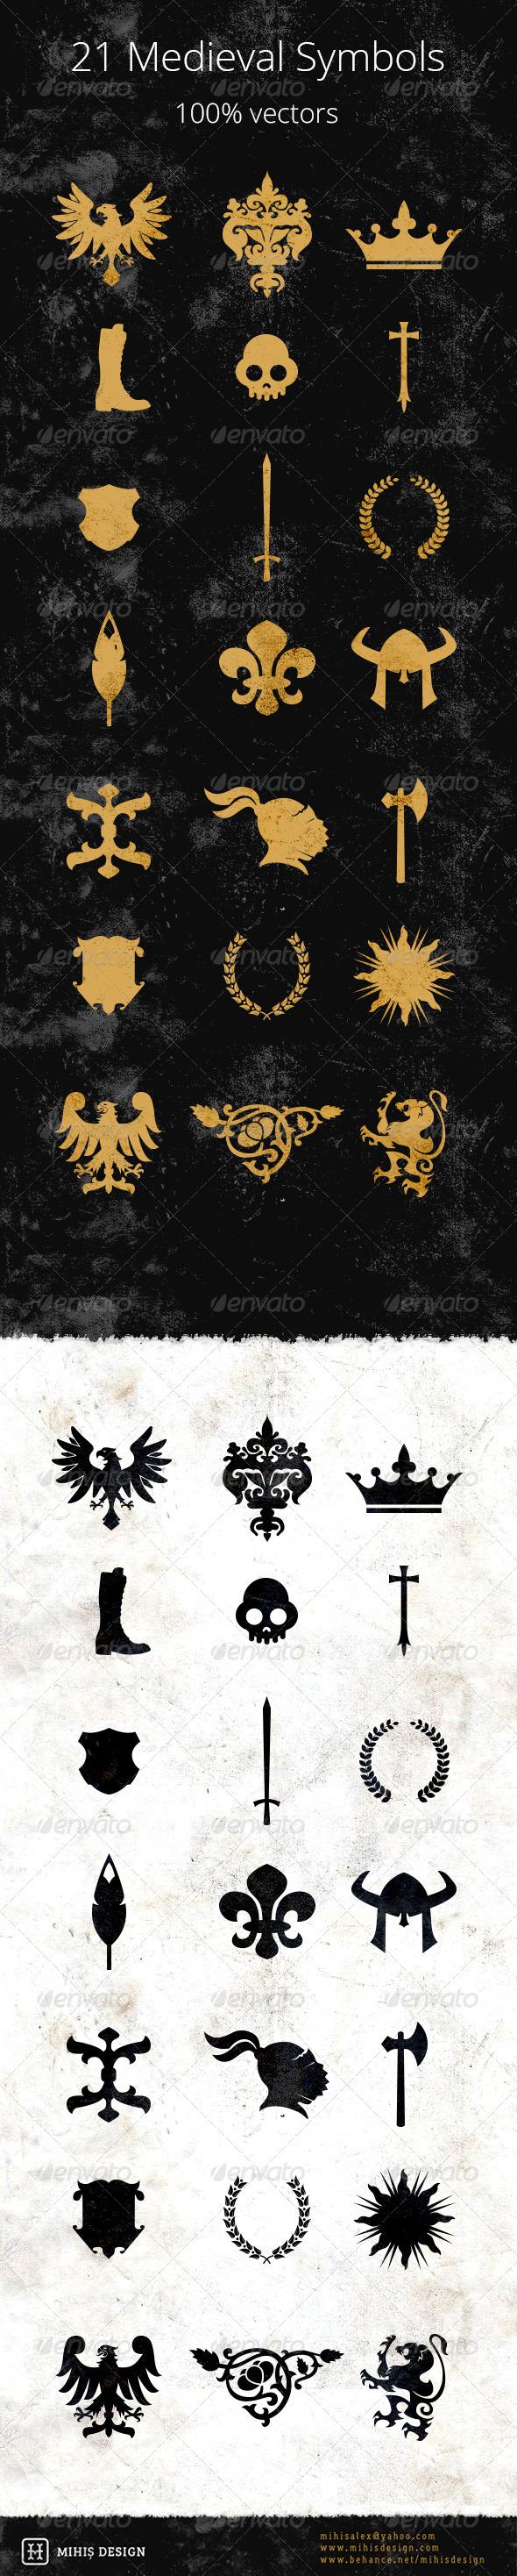 GraphicRiver 21 Medieval Symbols 7118704